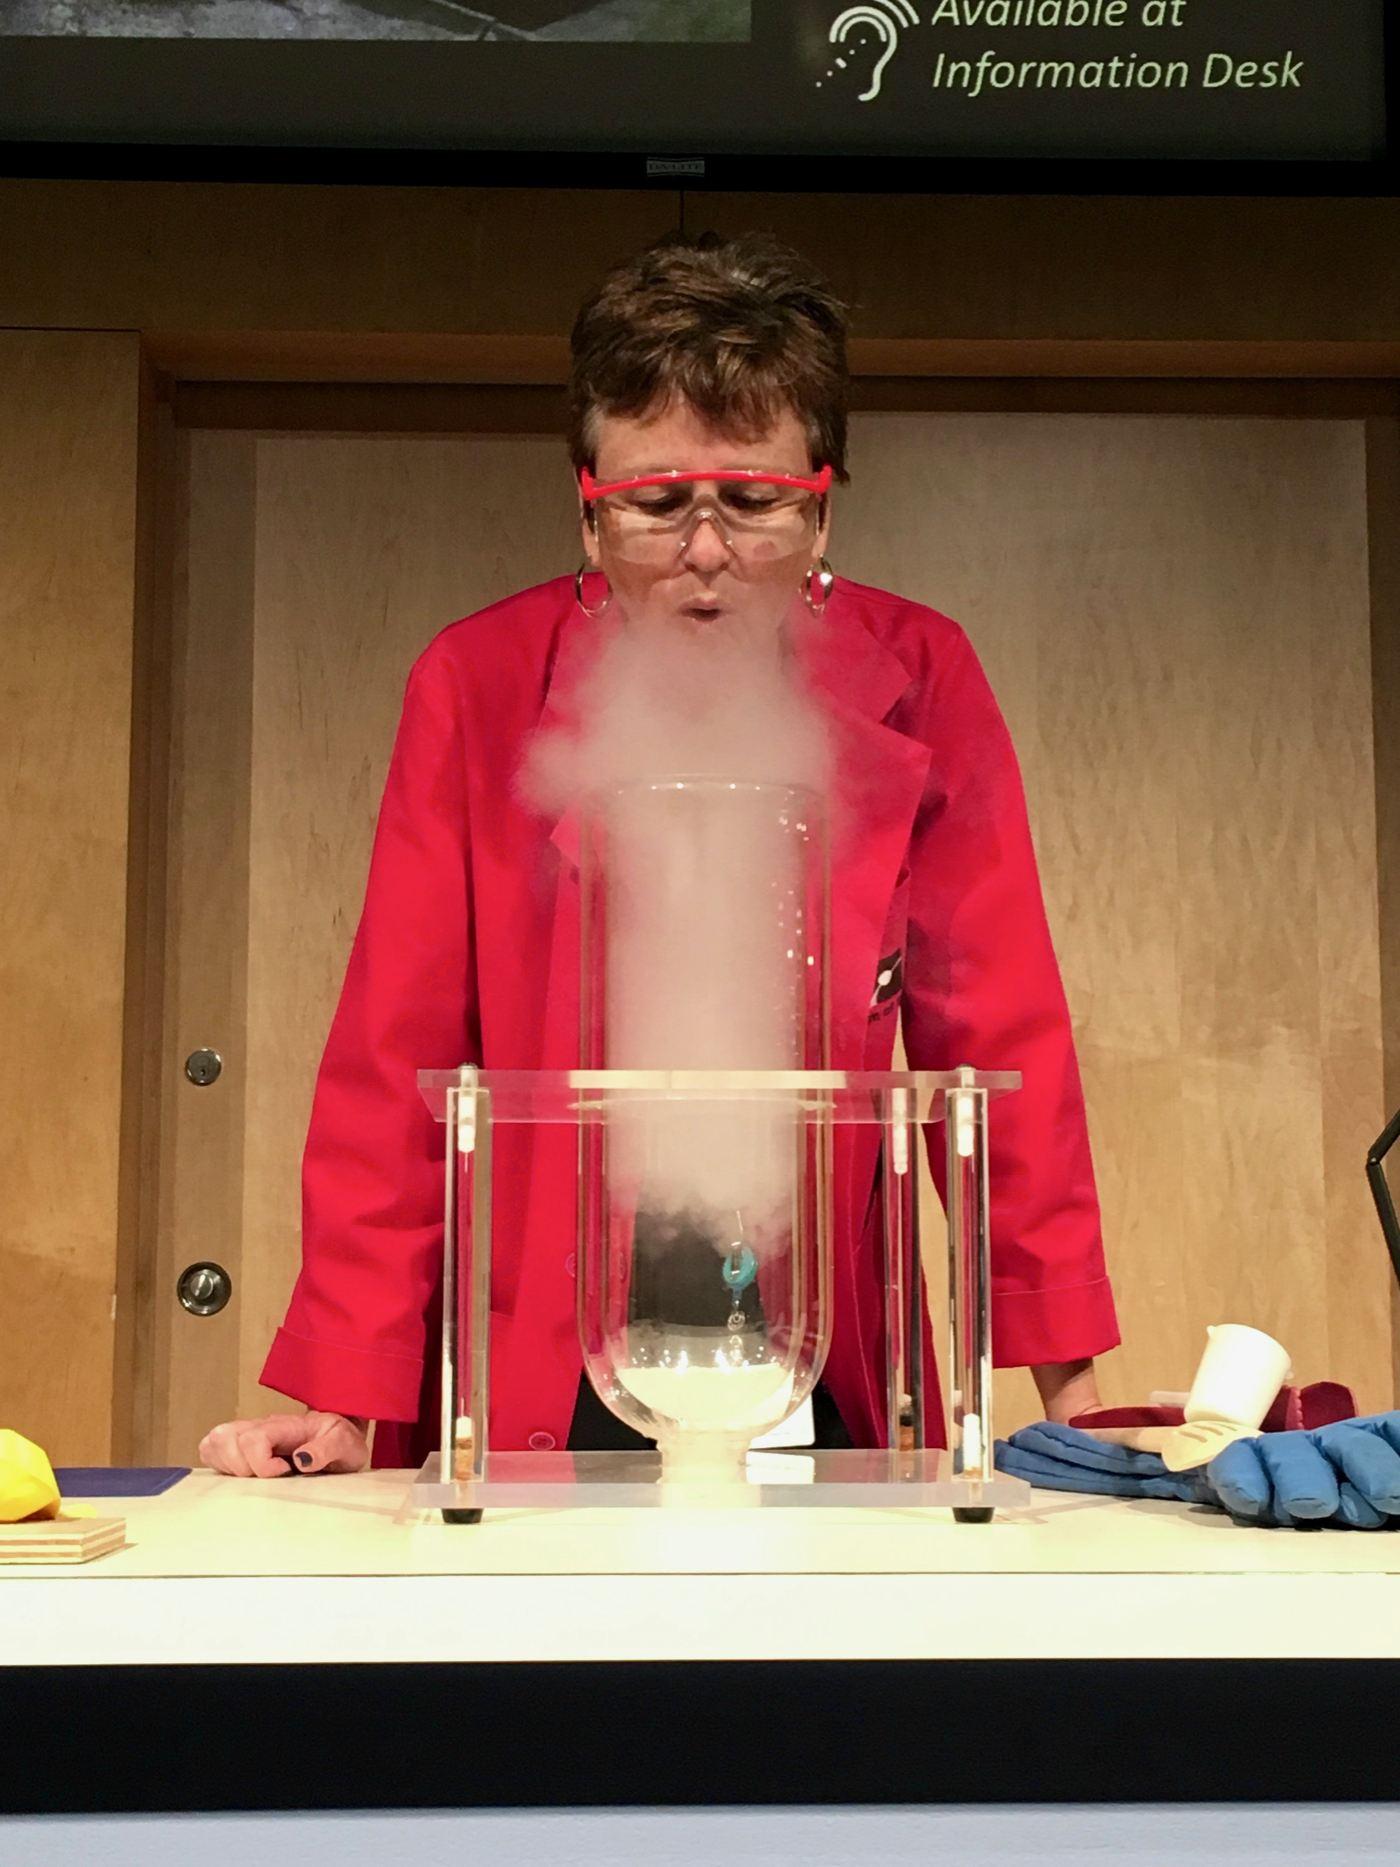 Museum jobs: Museum of Science, Boston